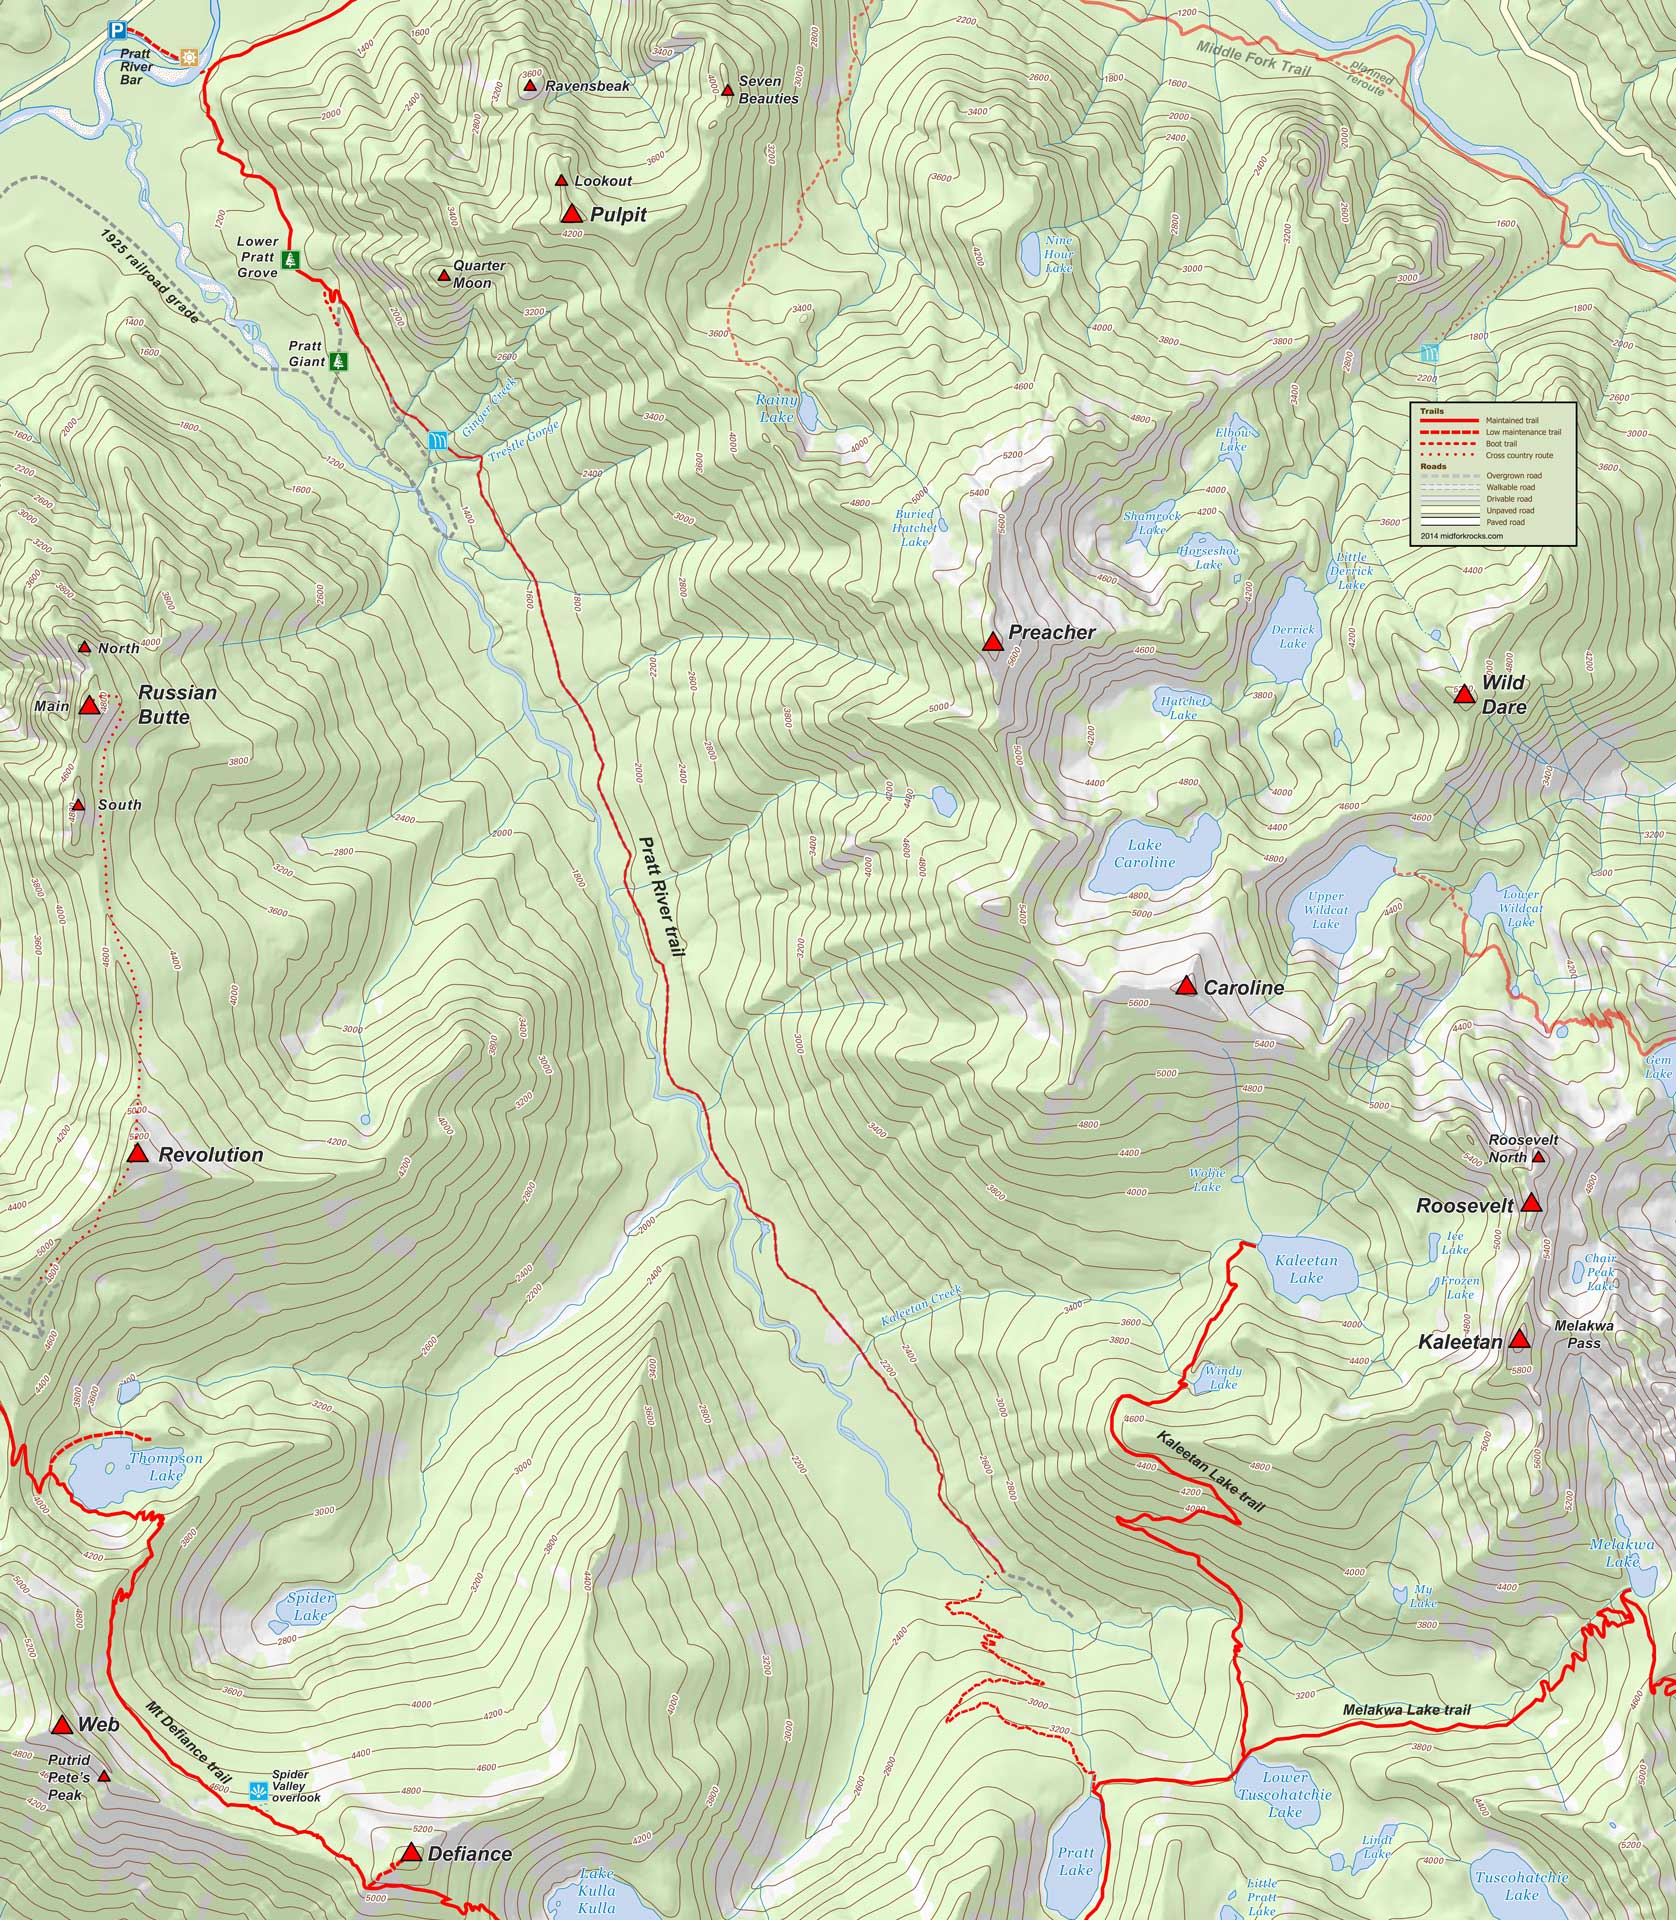 Pratt area map